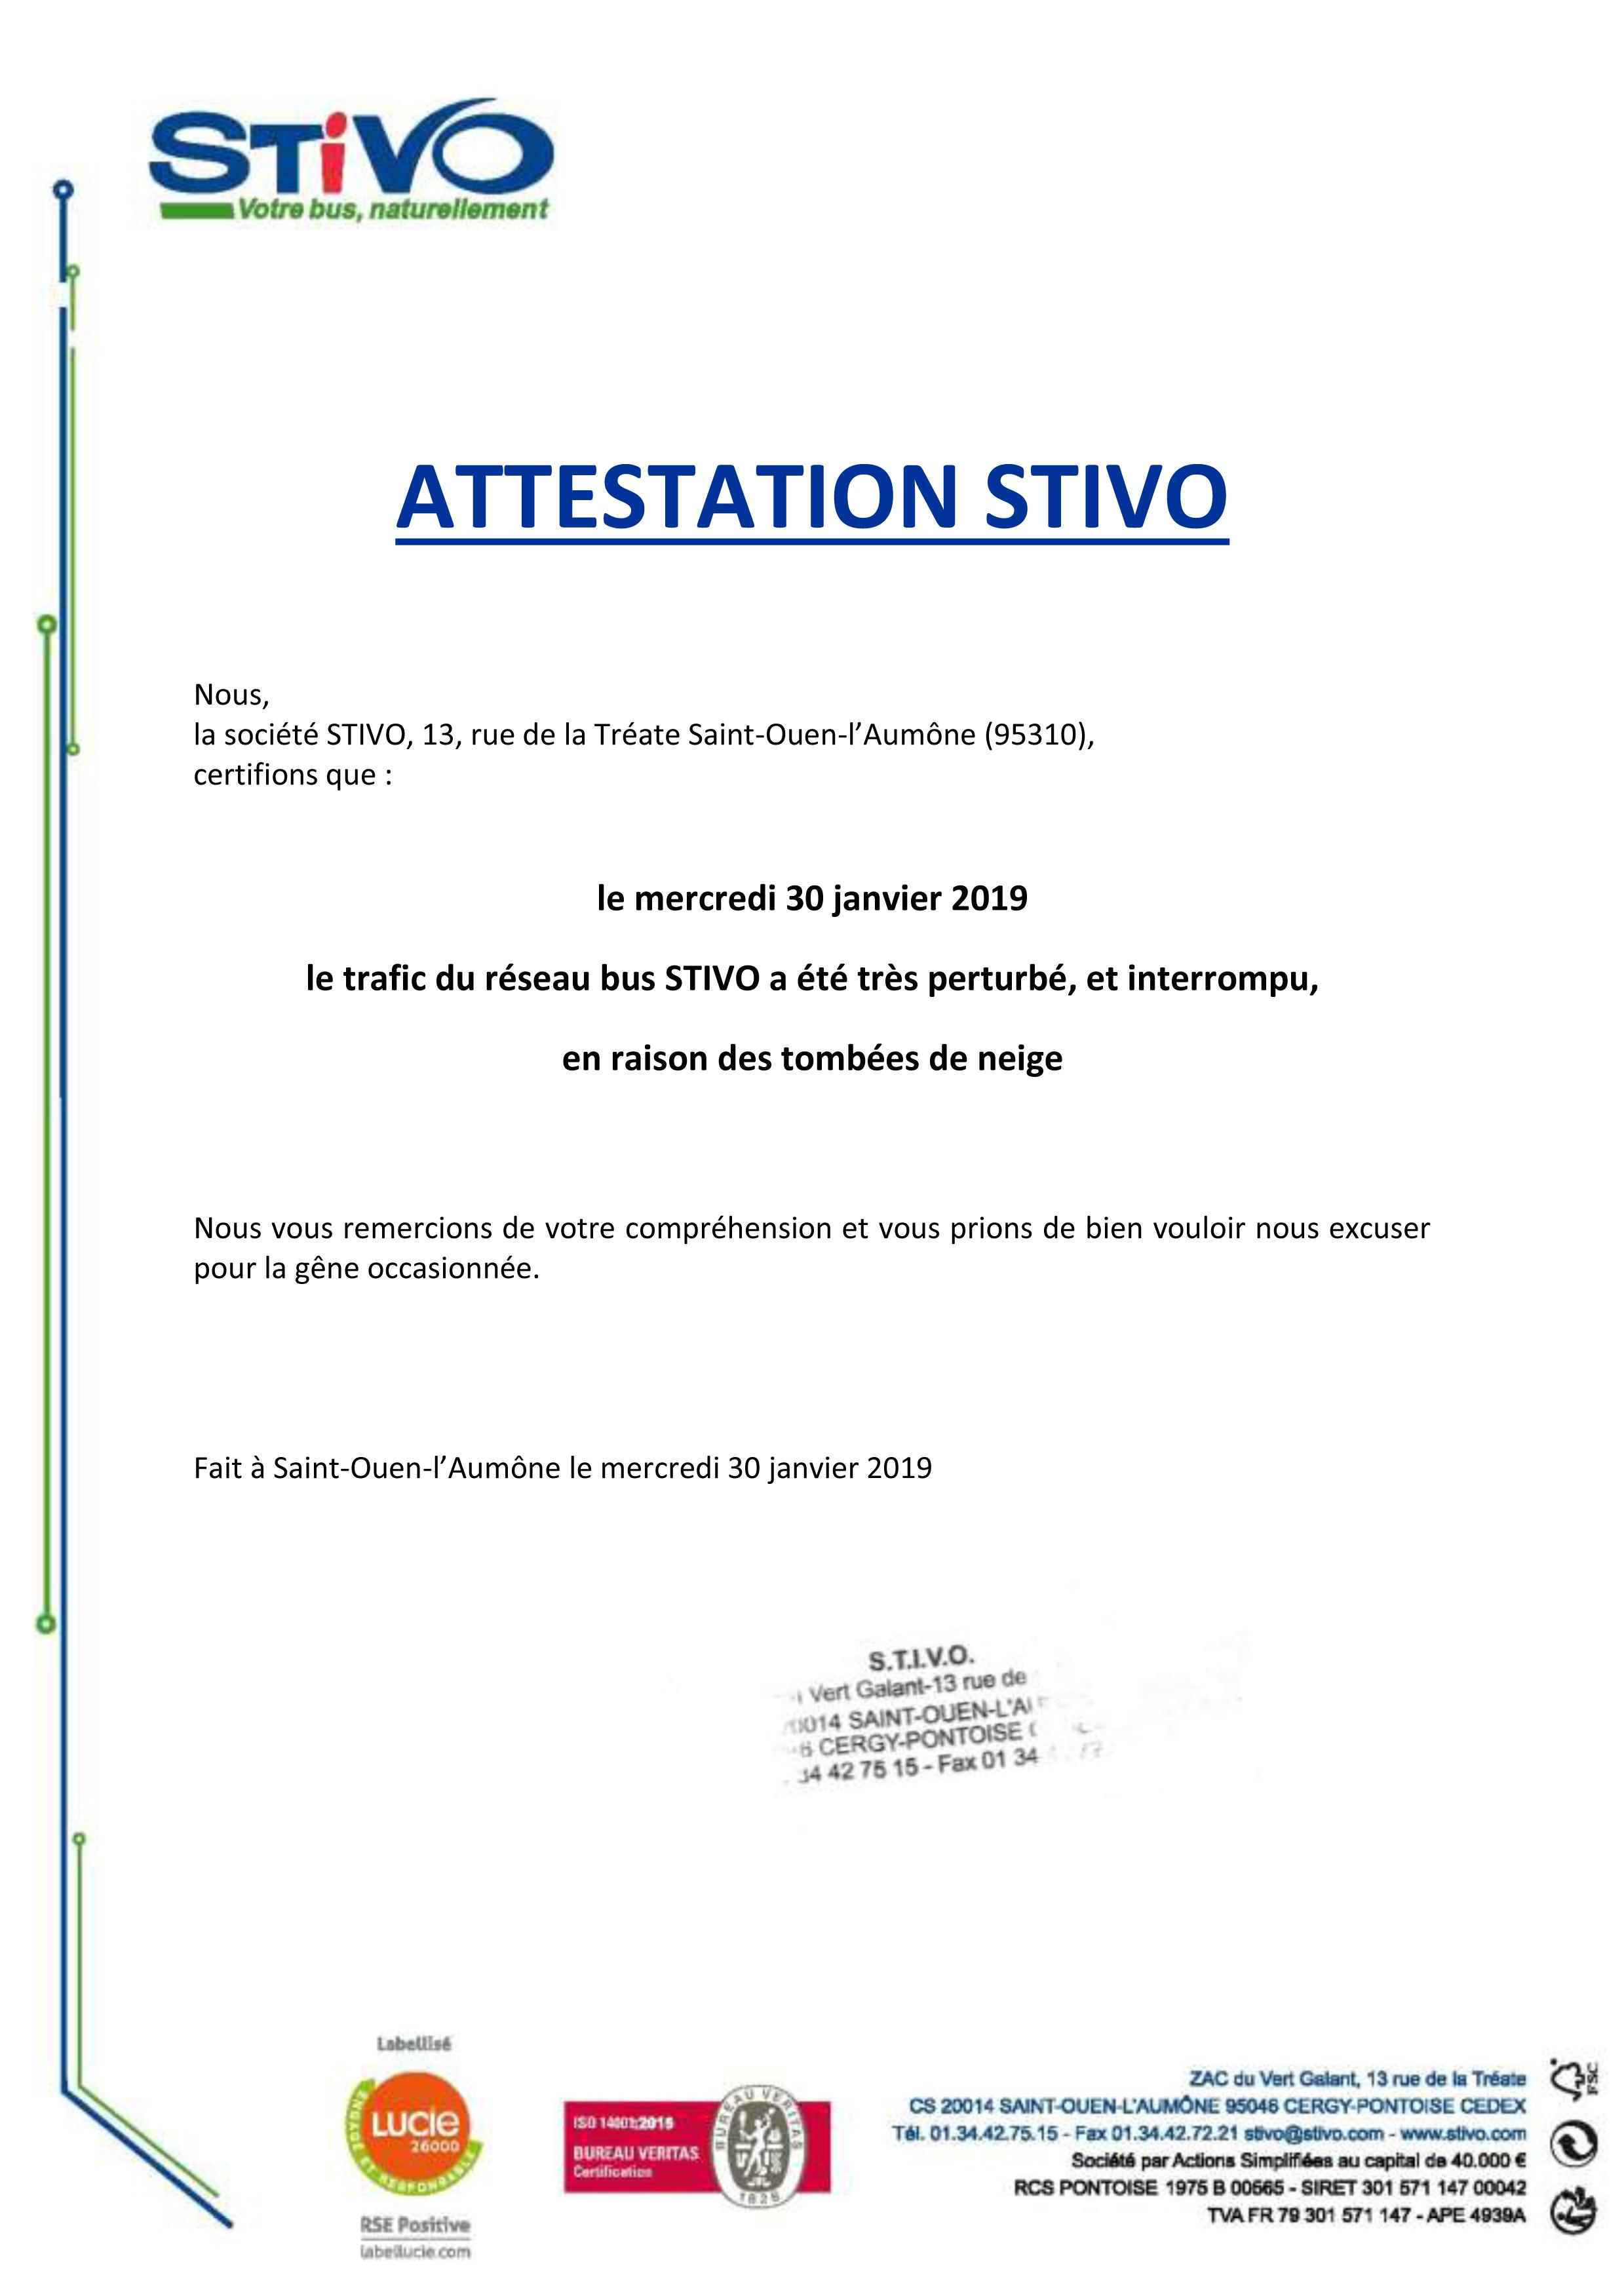 Attestation STIVO 30.01.2019